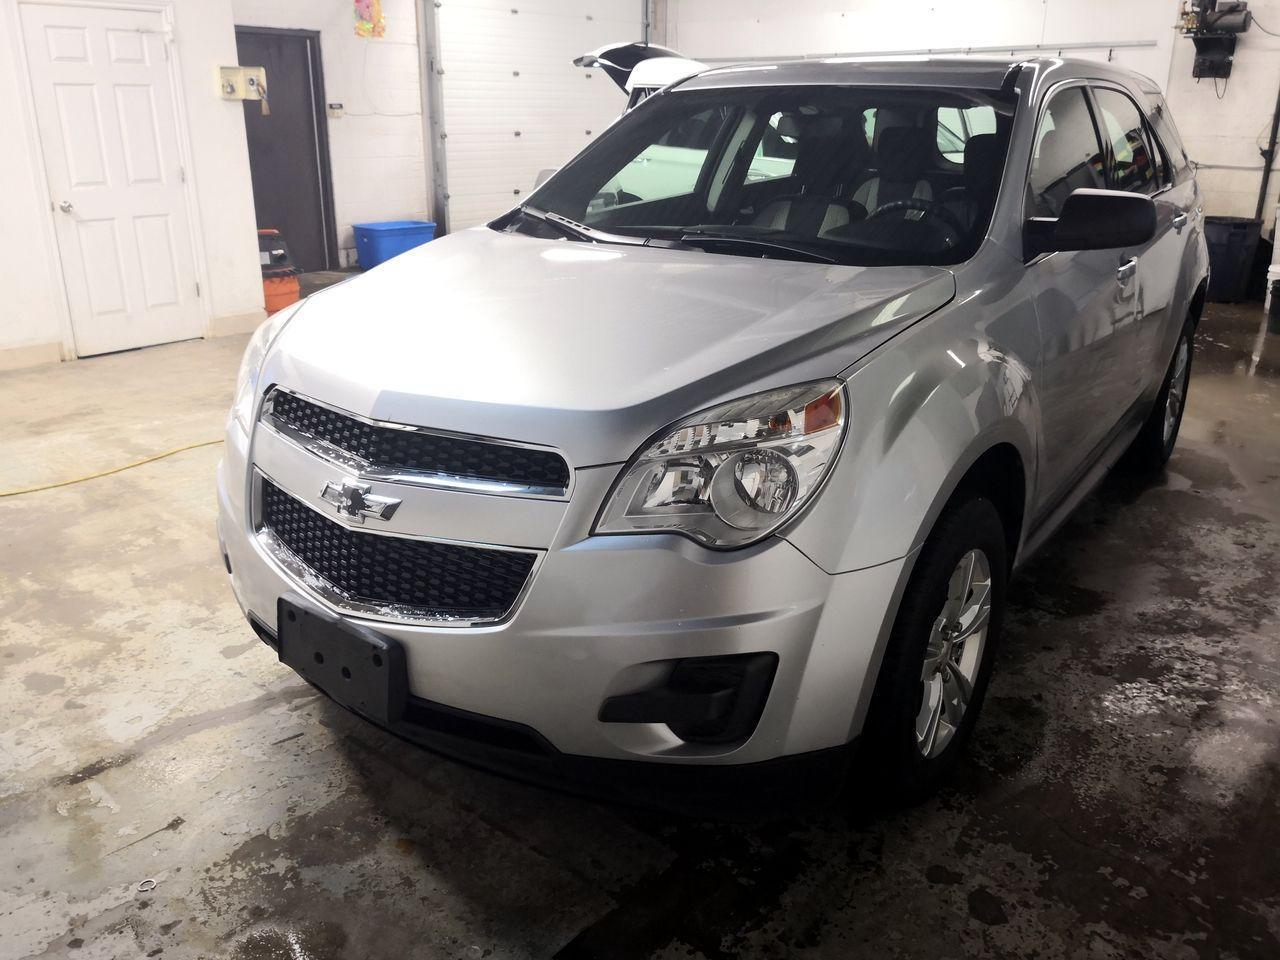 Photo of Silver 2011 Chevrolet Equinox